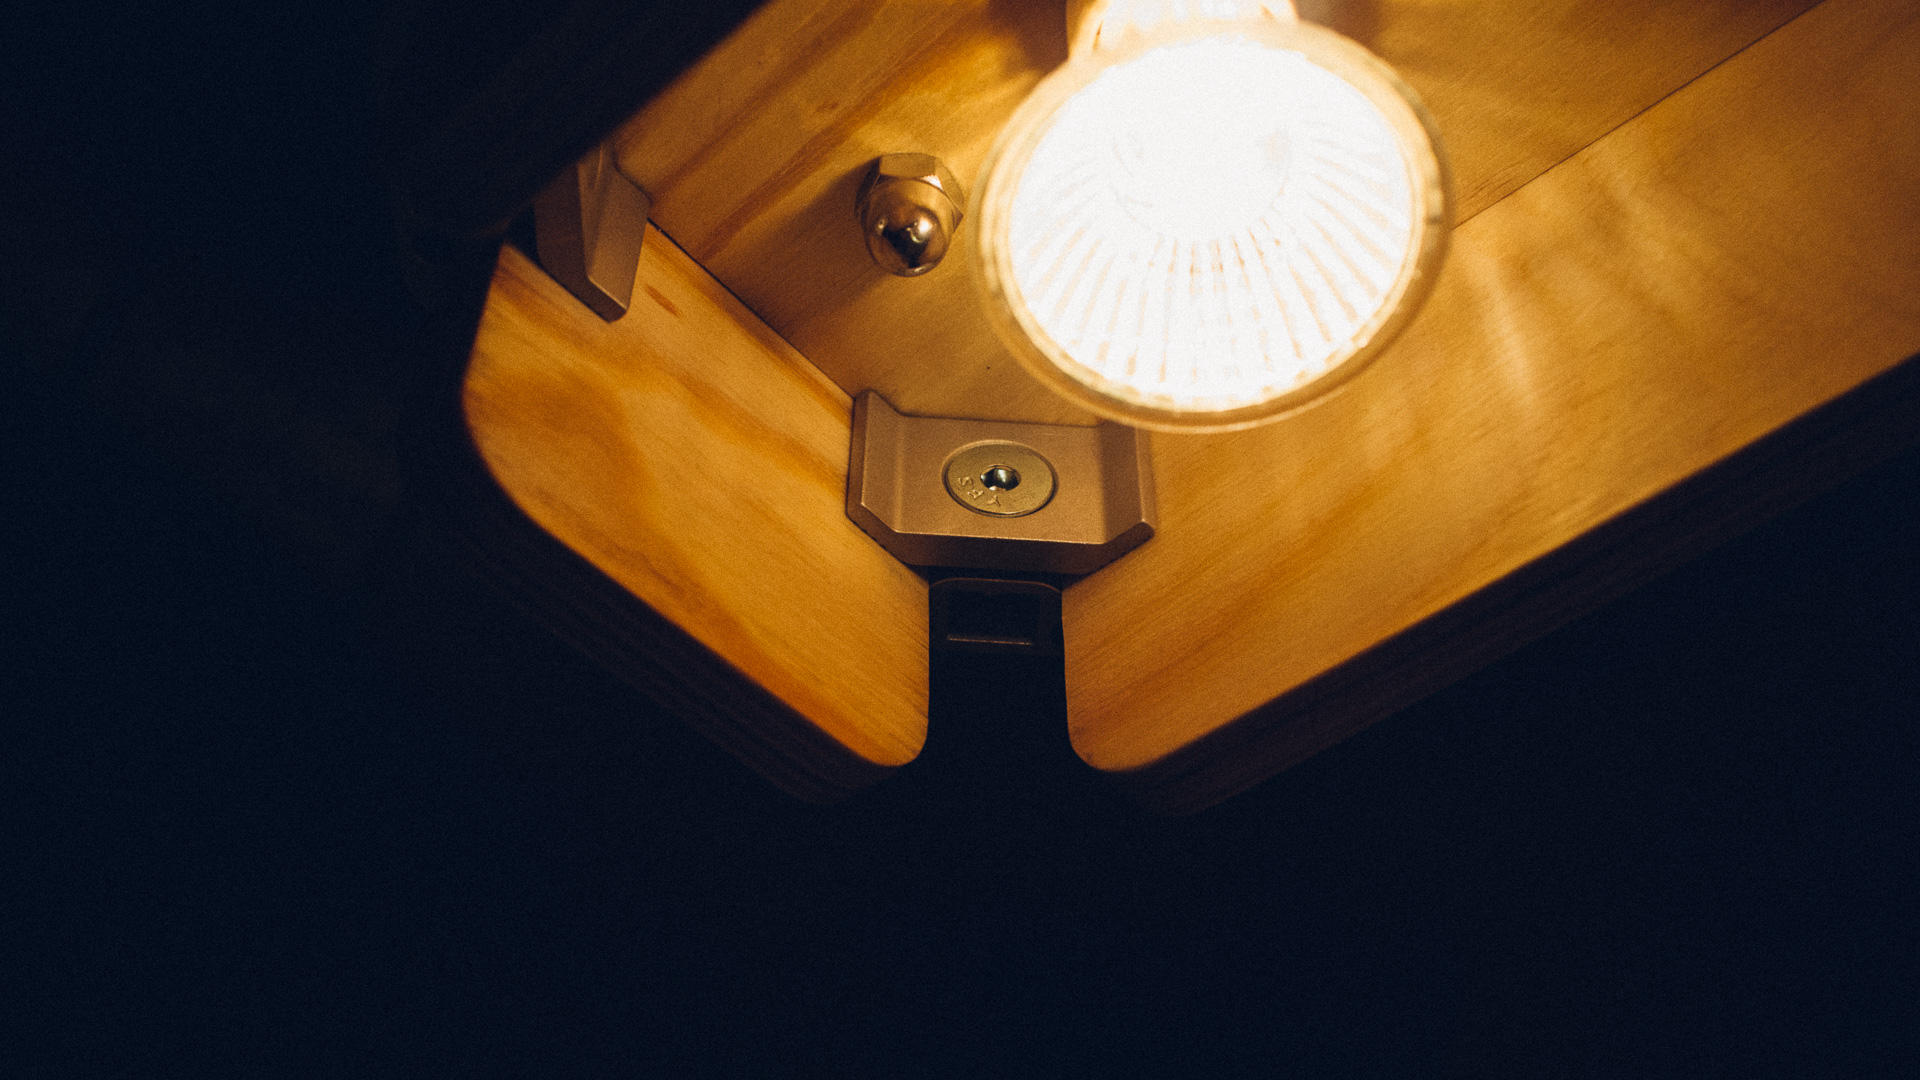 Making An Open Source Office Lamp